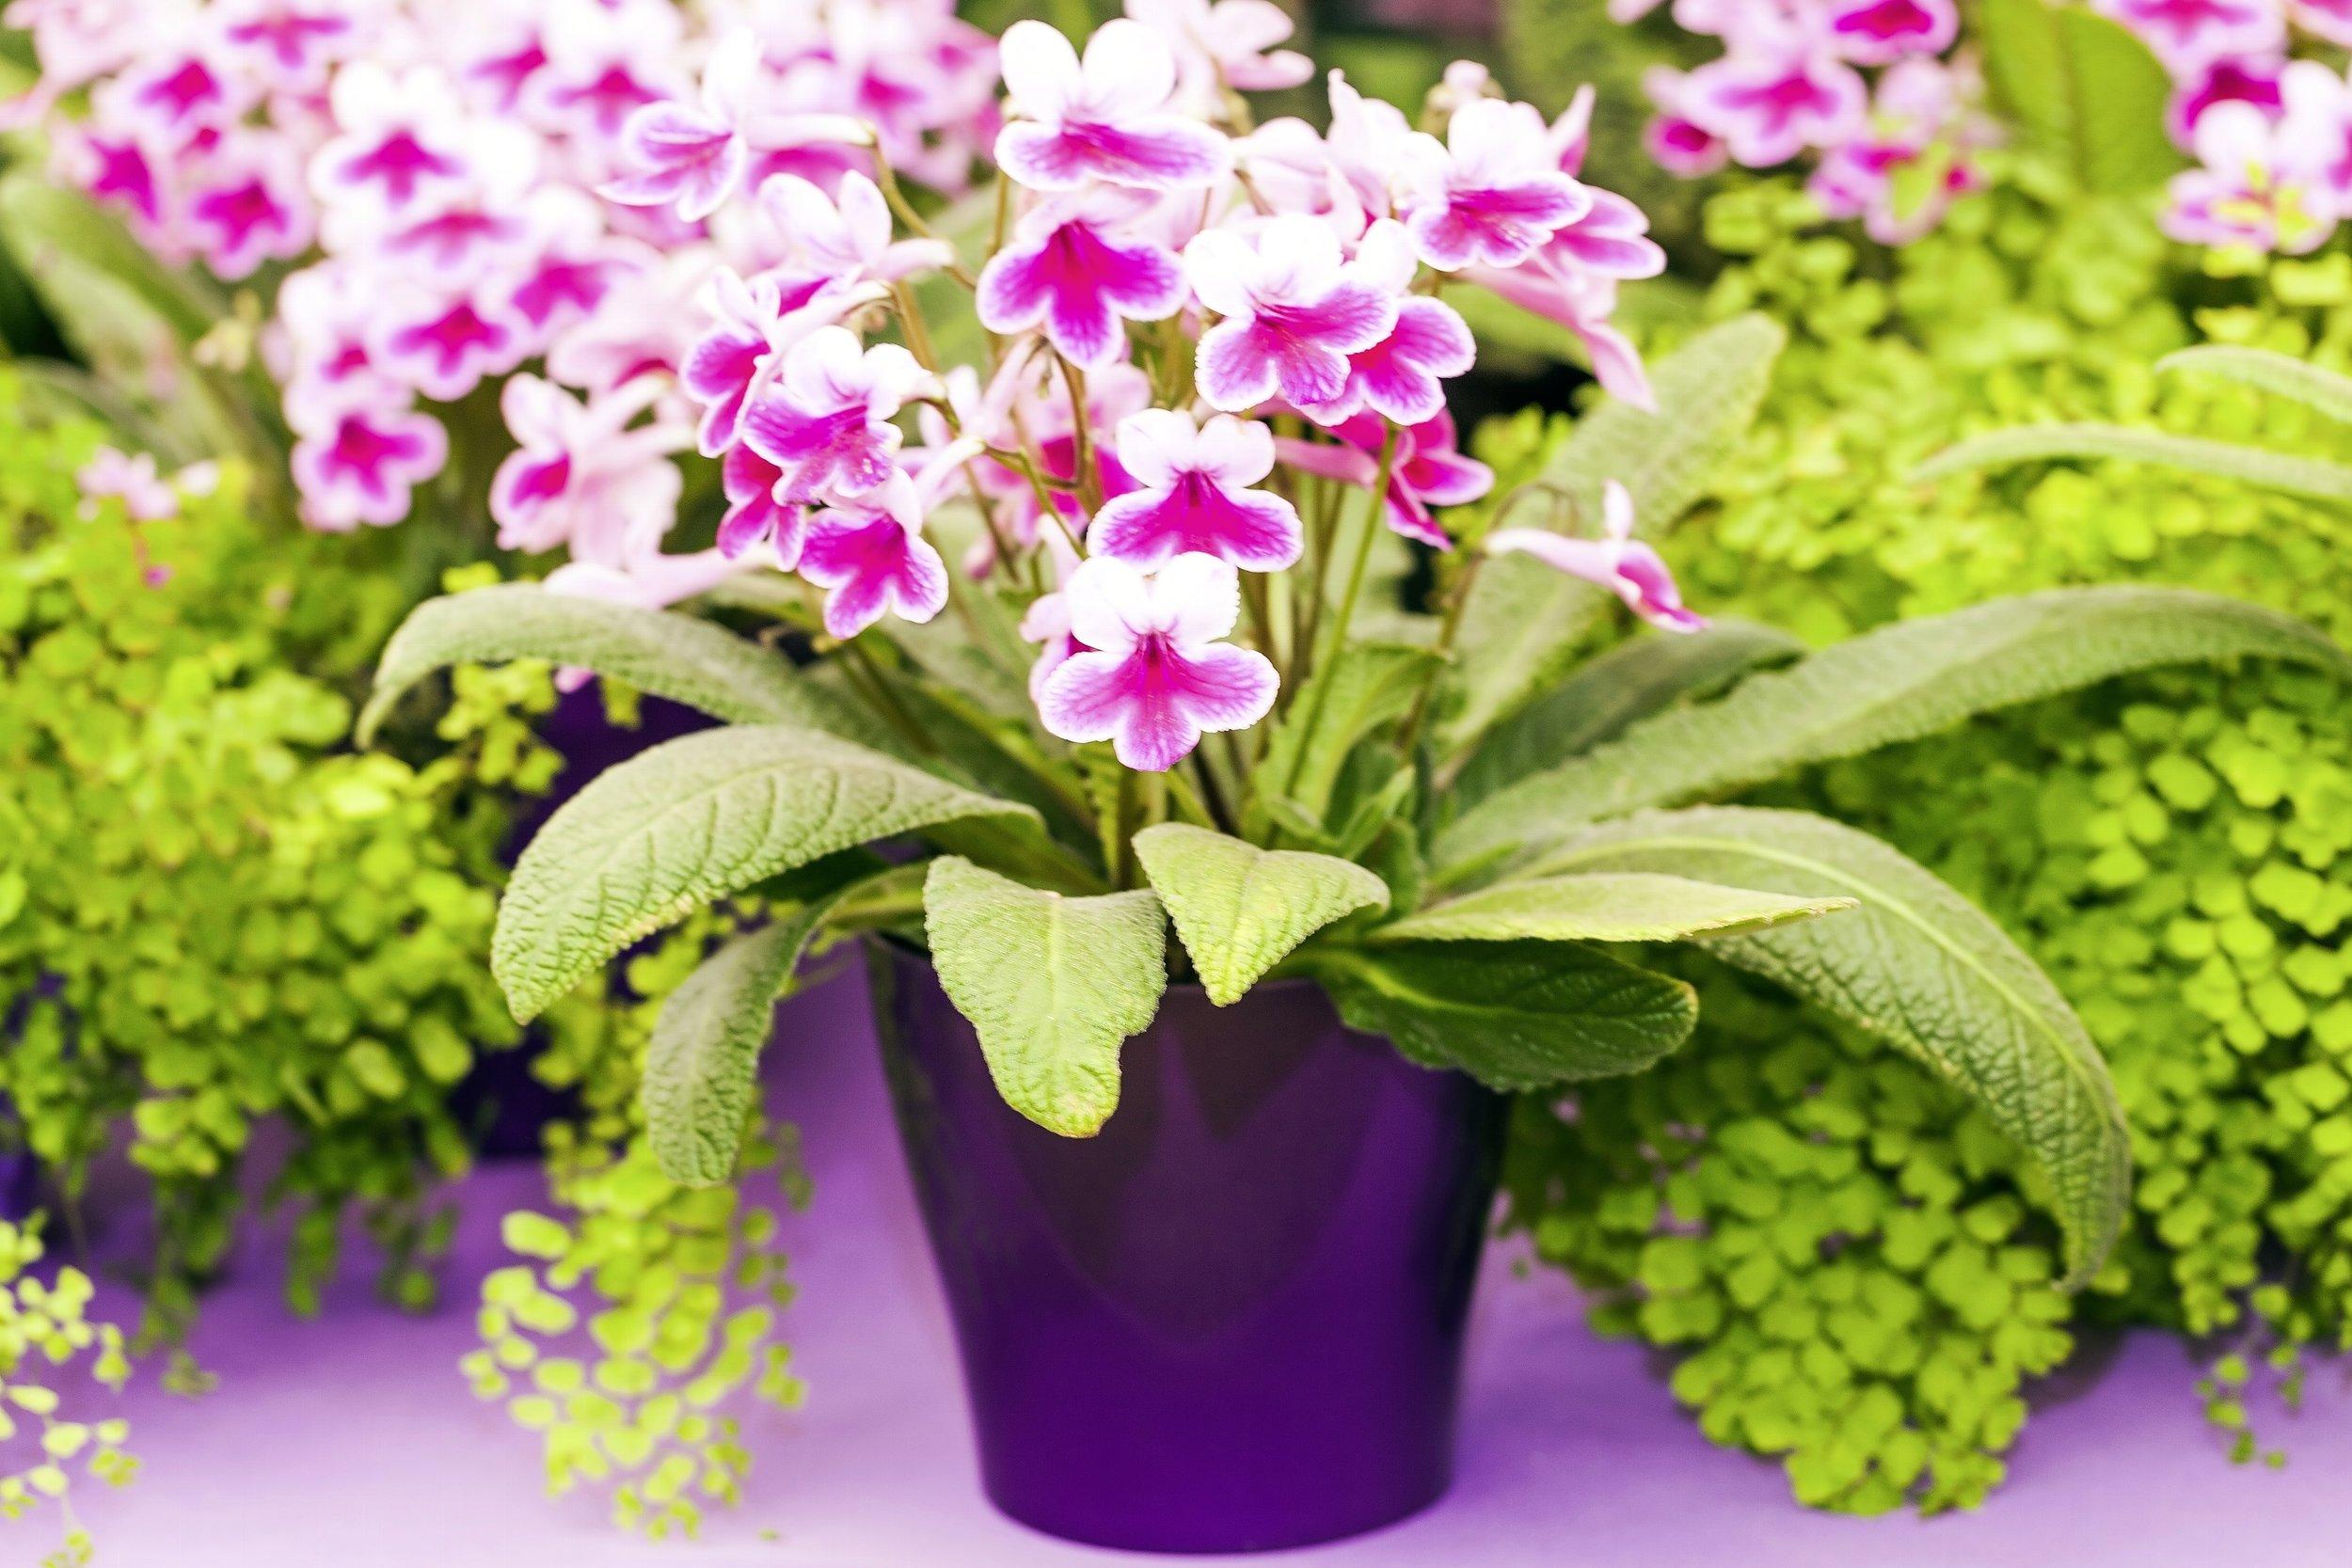 Streptocarpus are one of the most rewarding houseplants